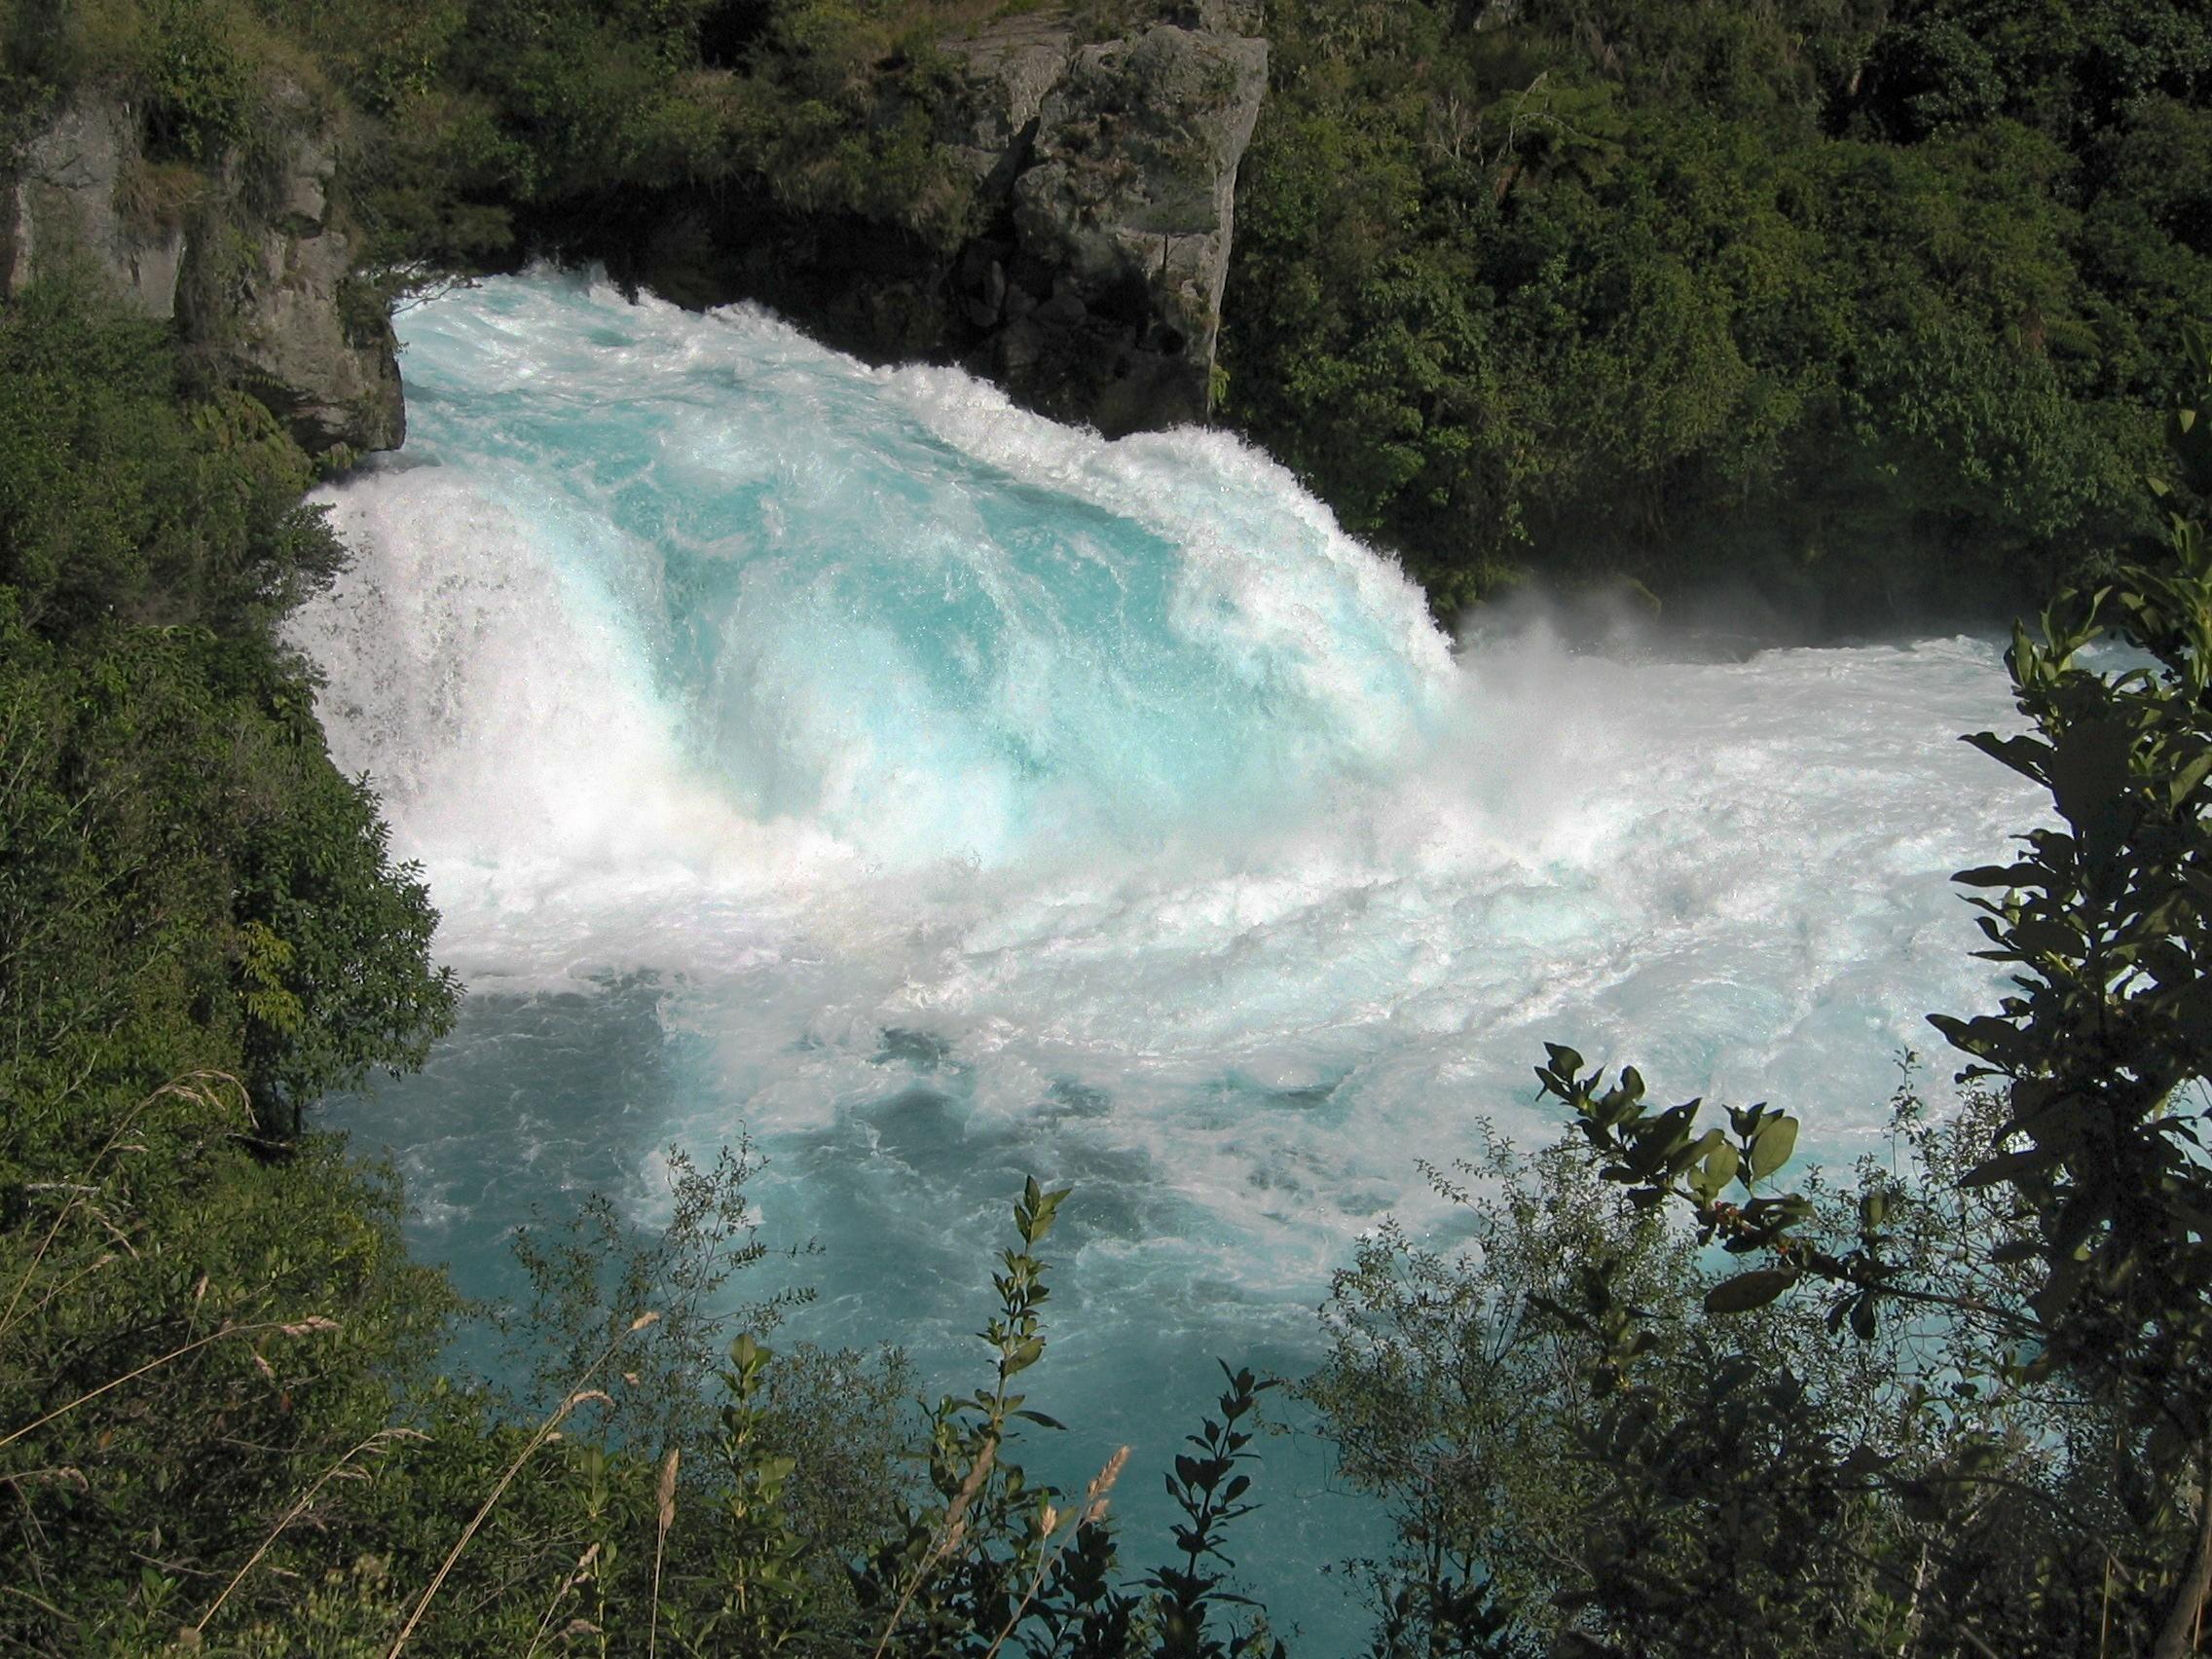 File:Huka Falls.jpg - Wikimedia Commons